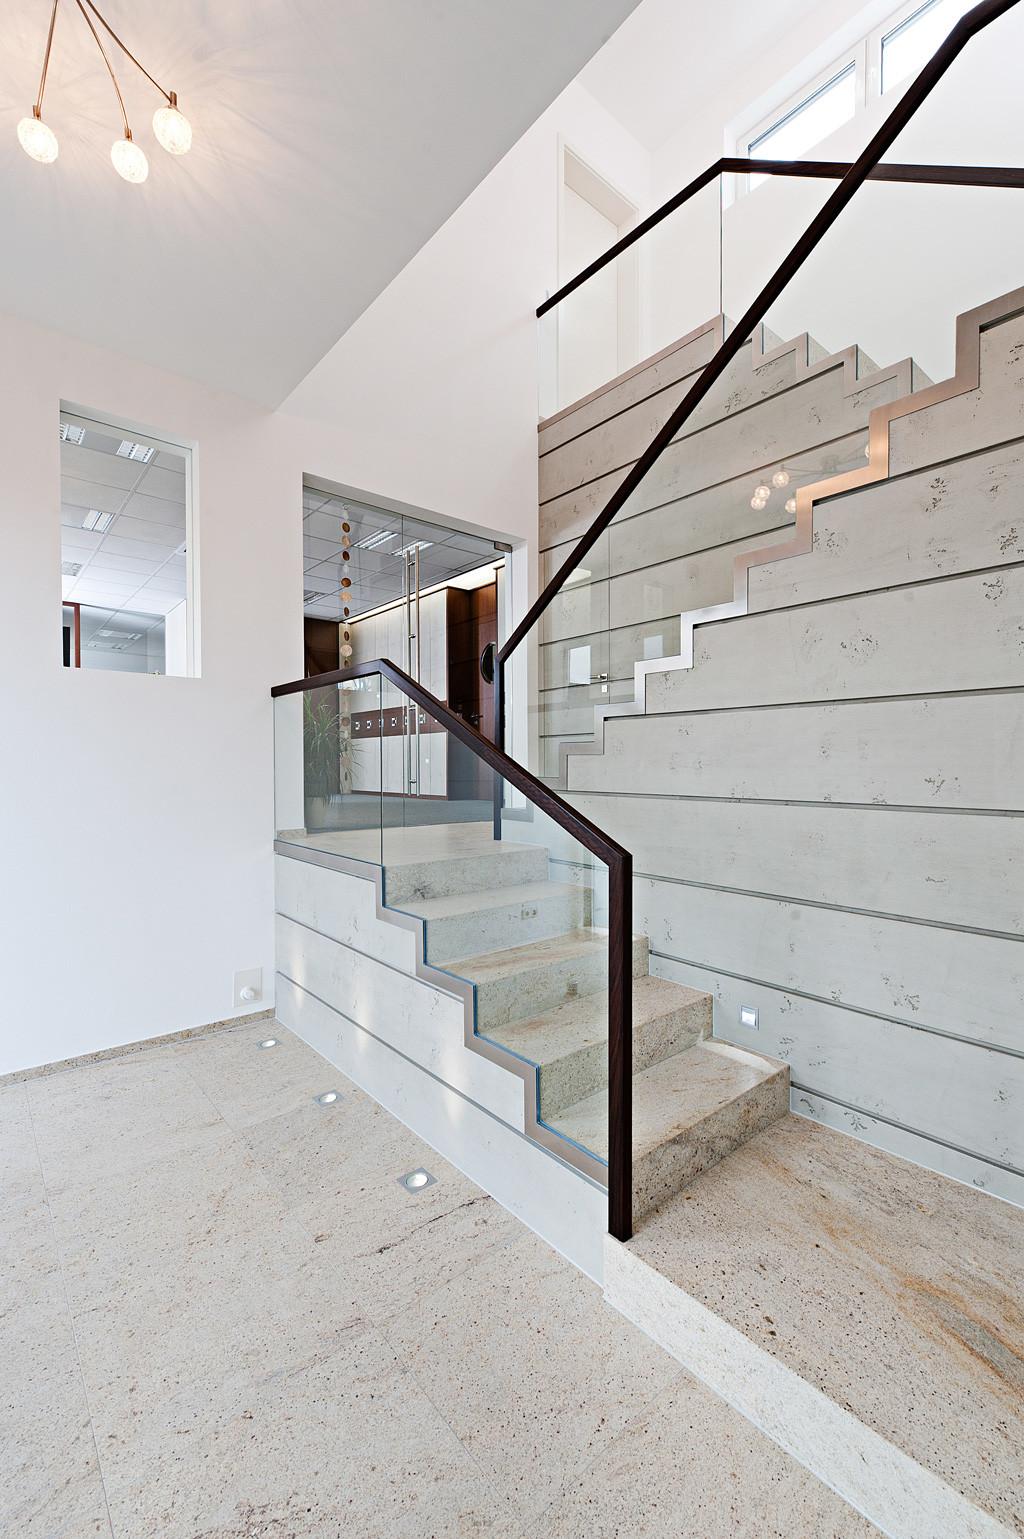 imi beton drimensa b v. Black Bedroom Furniture Sets. Home Design Ideas